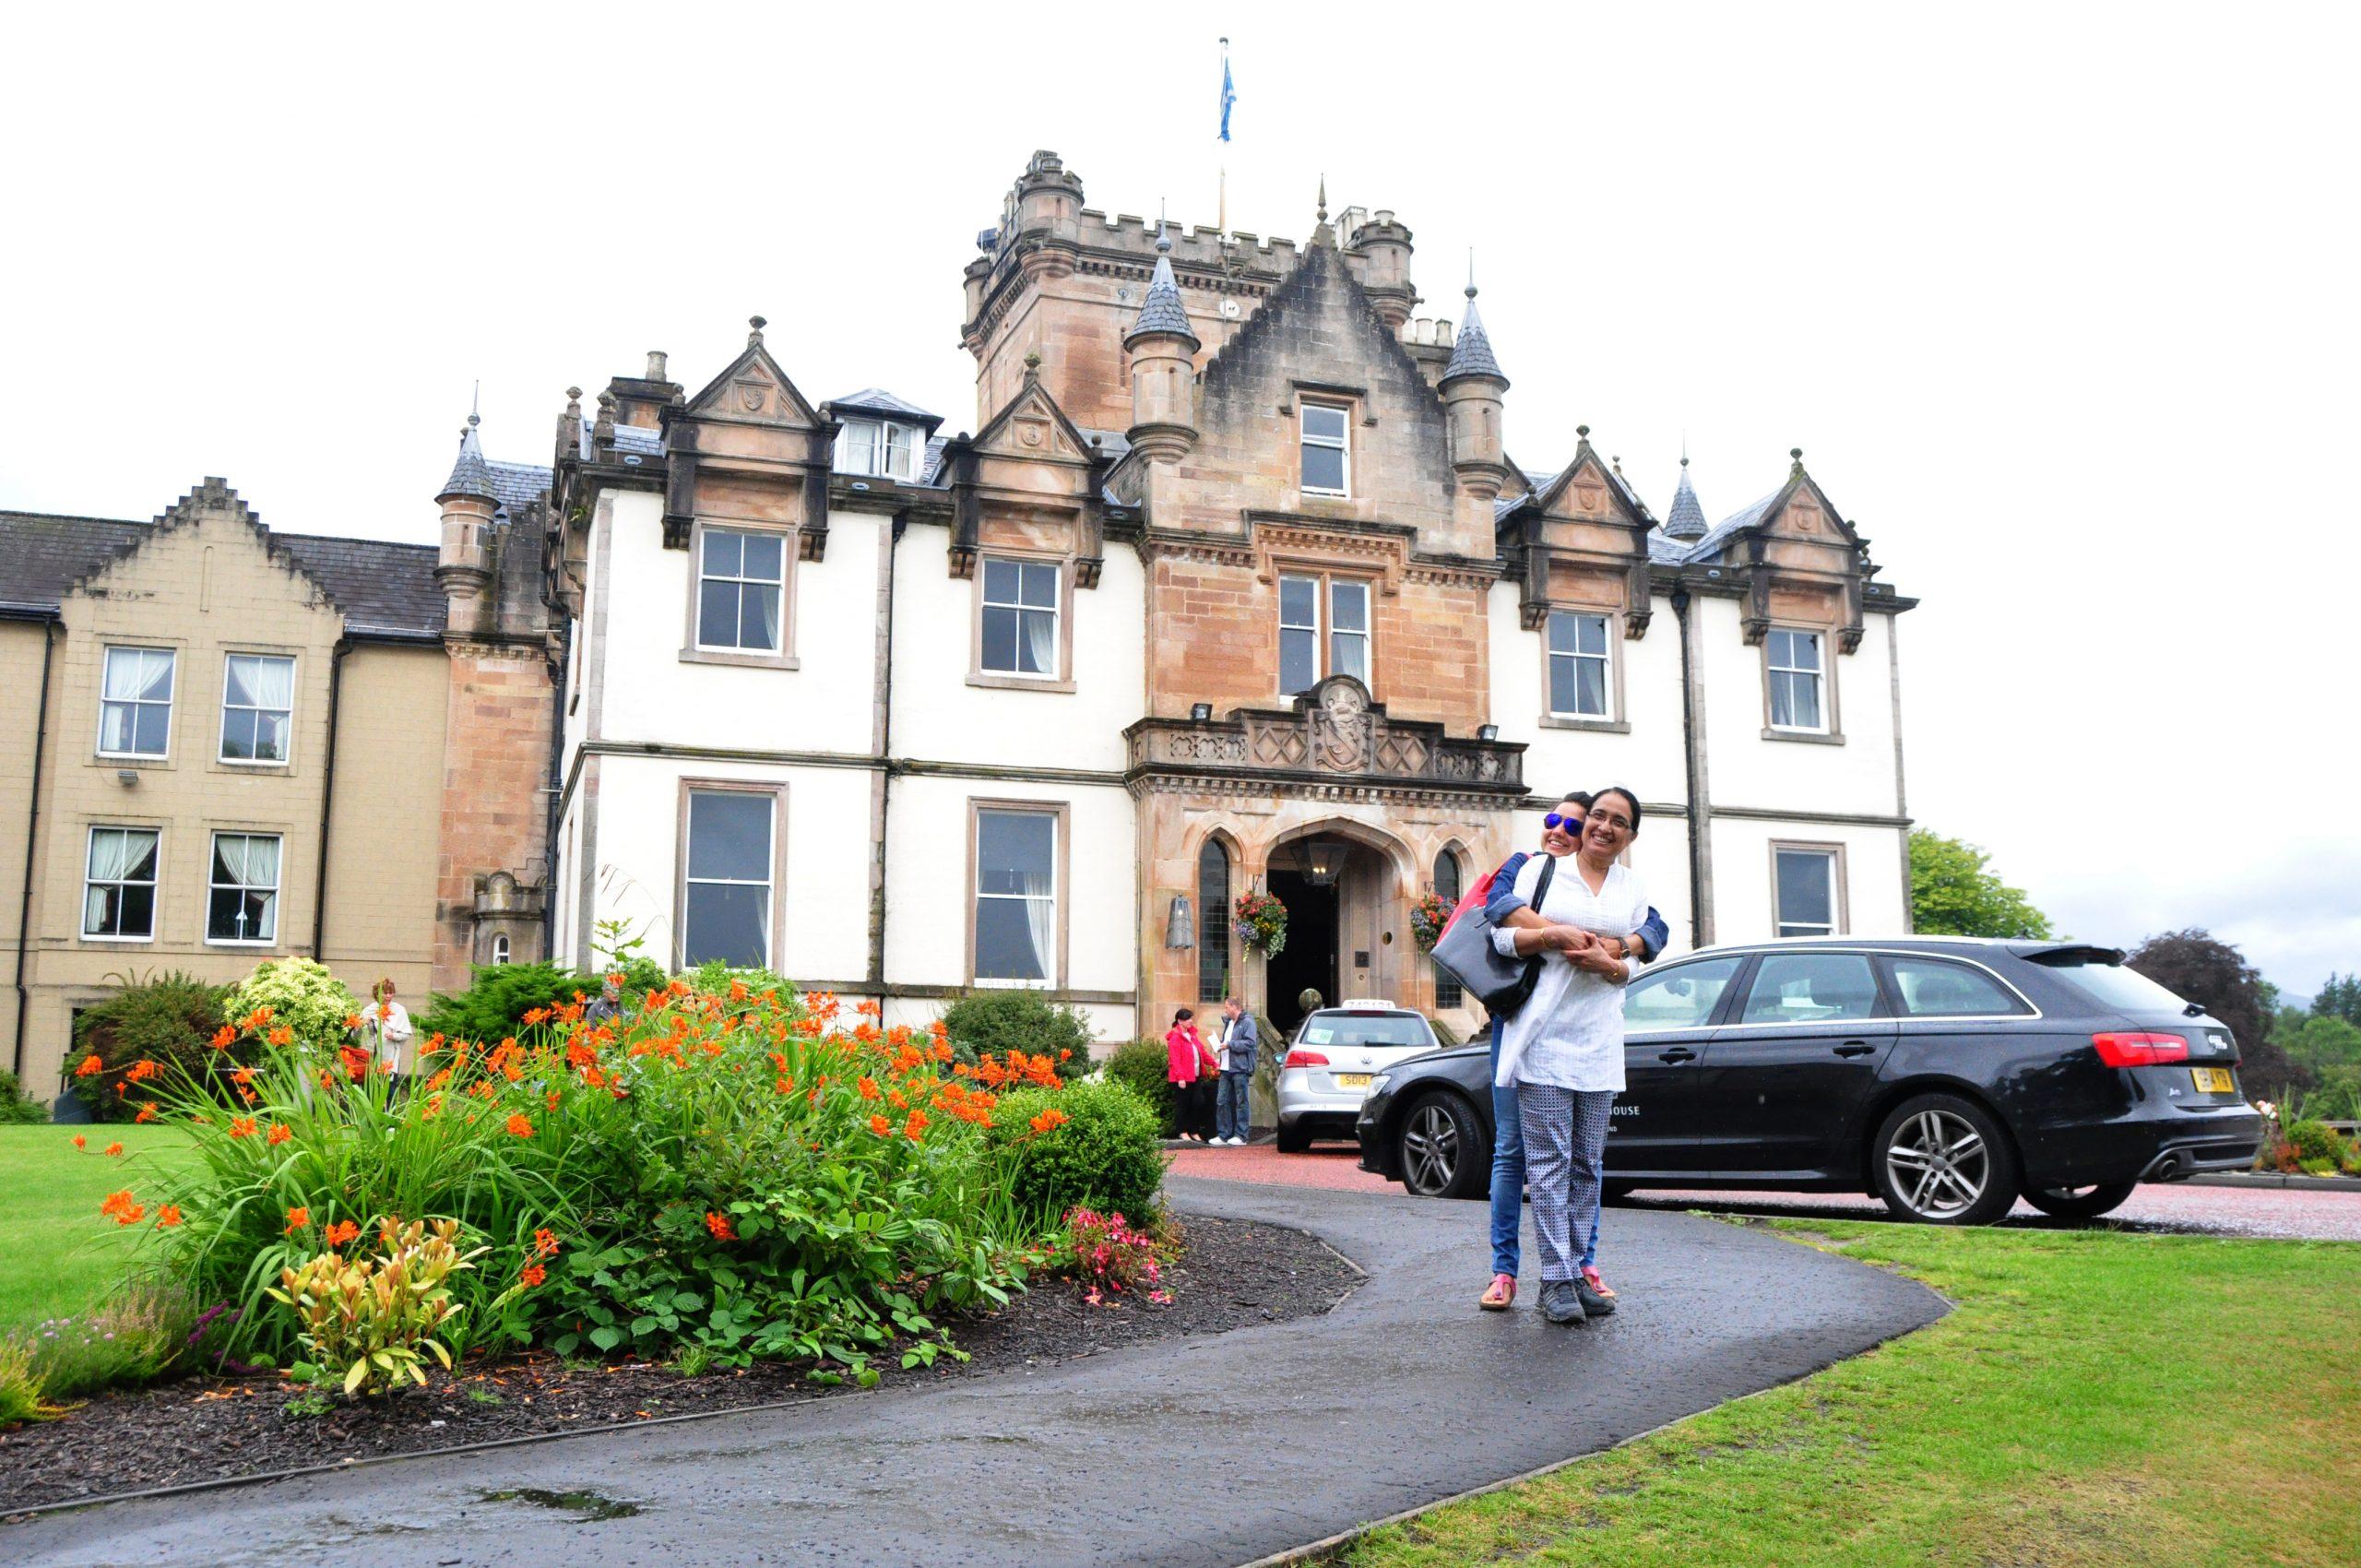 De Vere Cameron House, Loch Lomond, Scotland